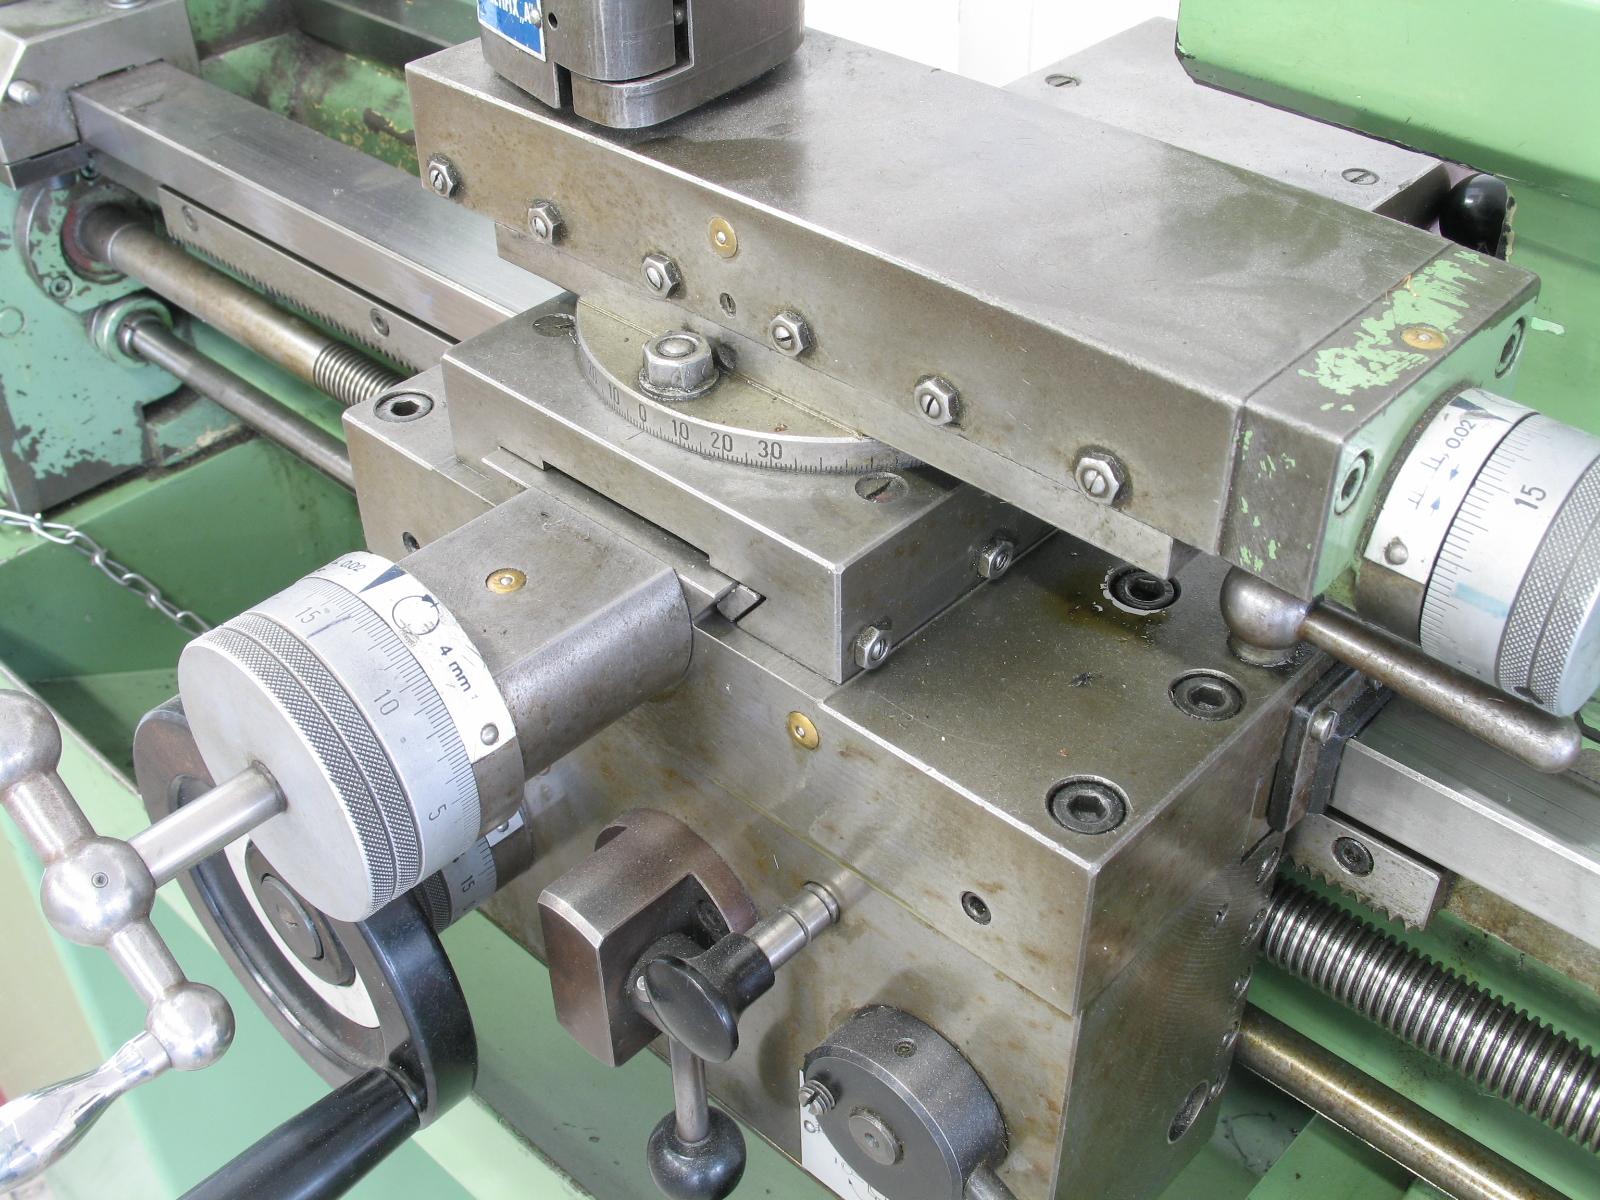 lathe-machines-1178287